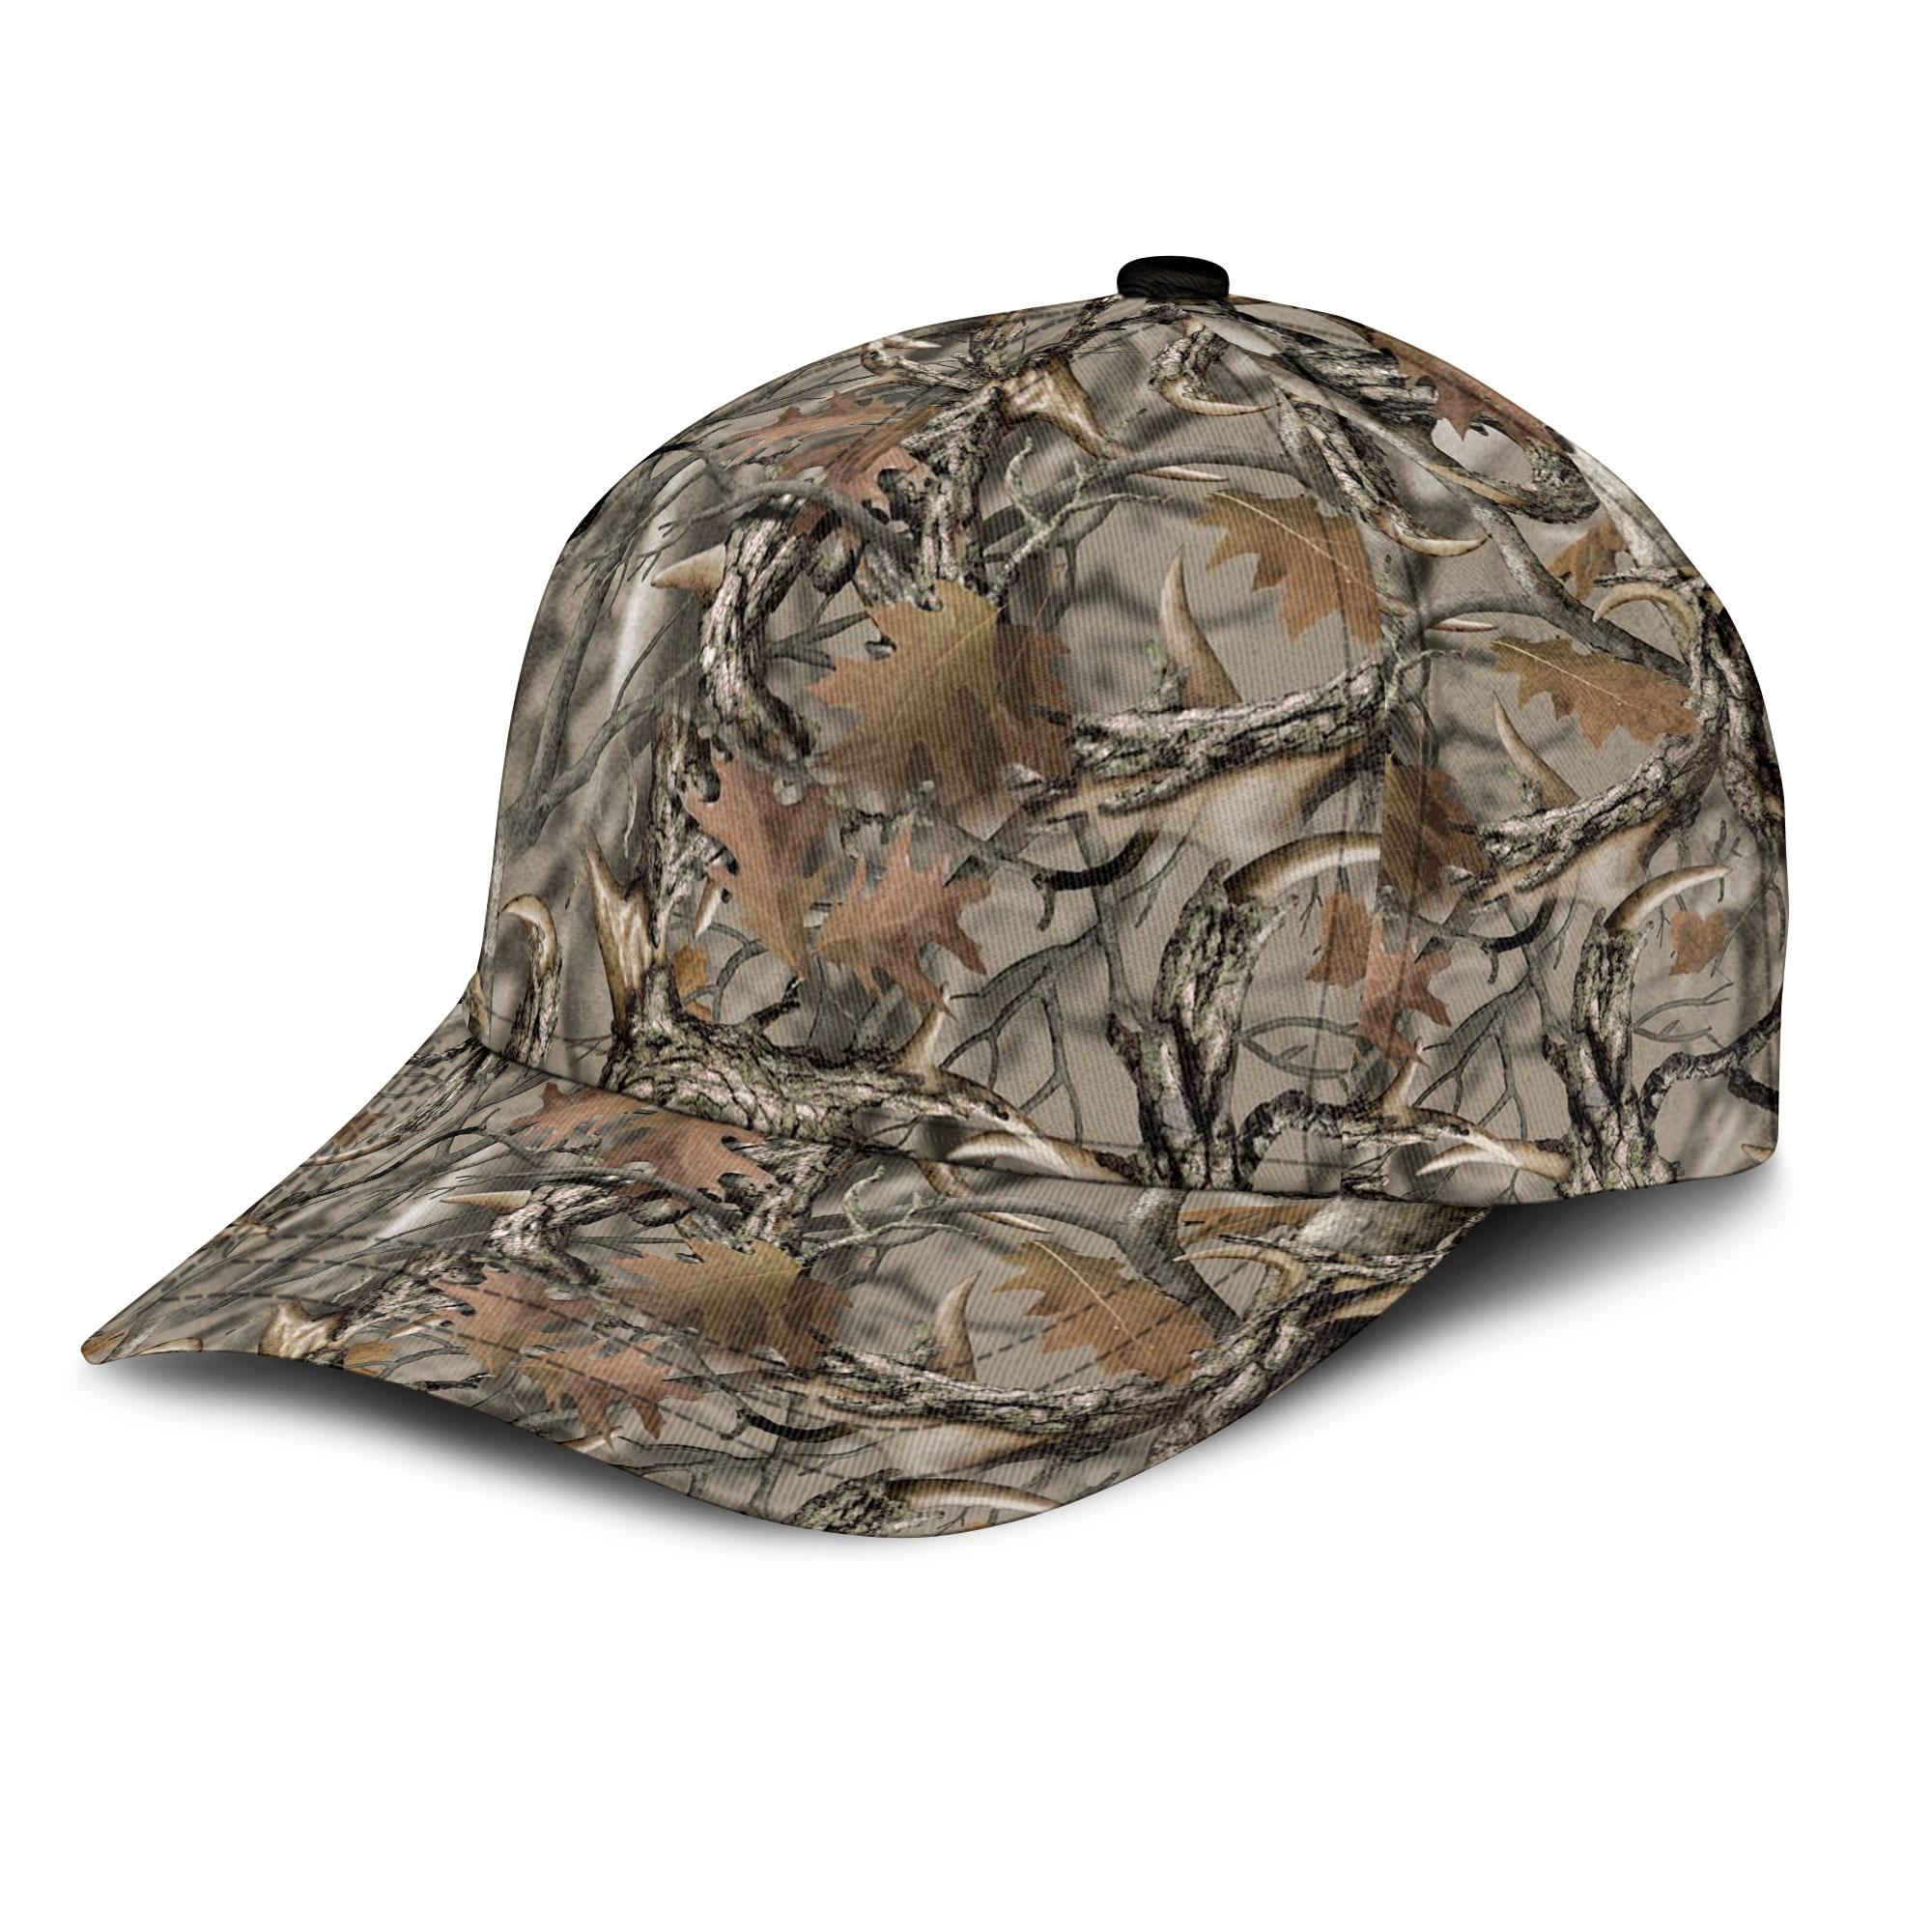 Love Hunting Camouflage Sku 116 Classic Cap